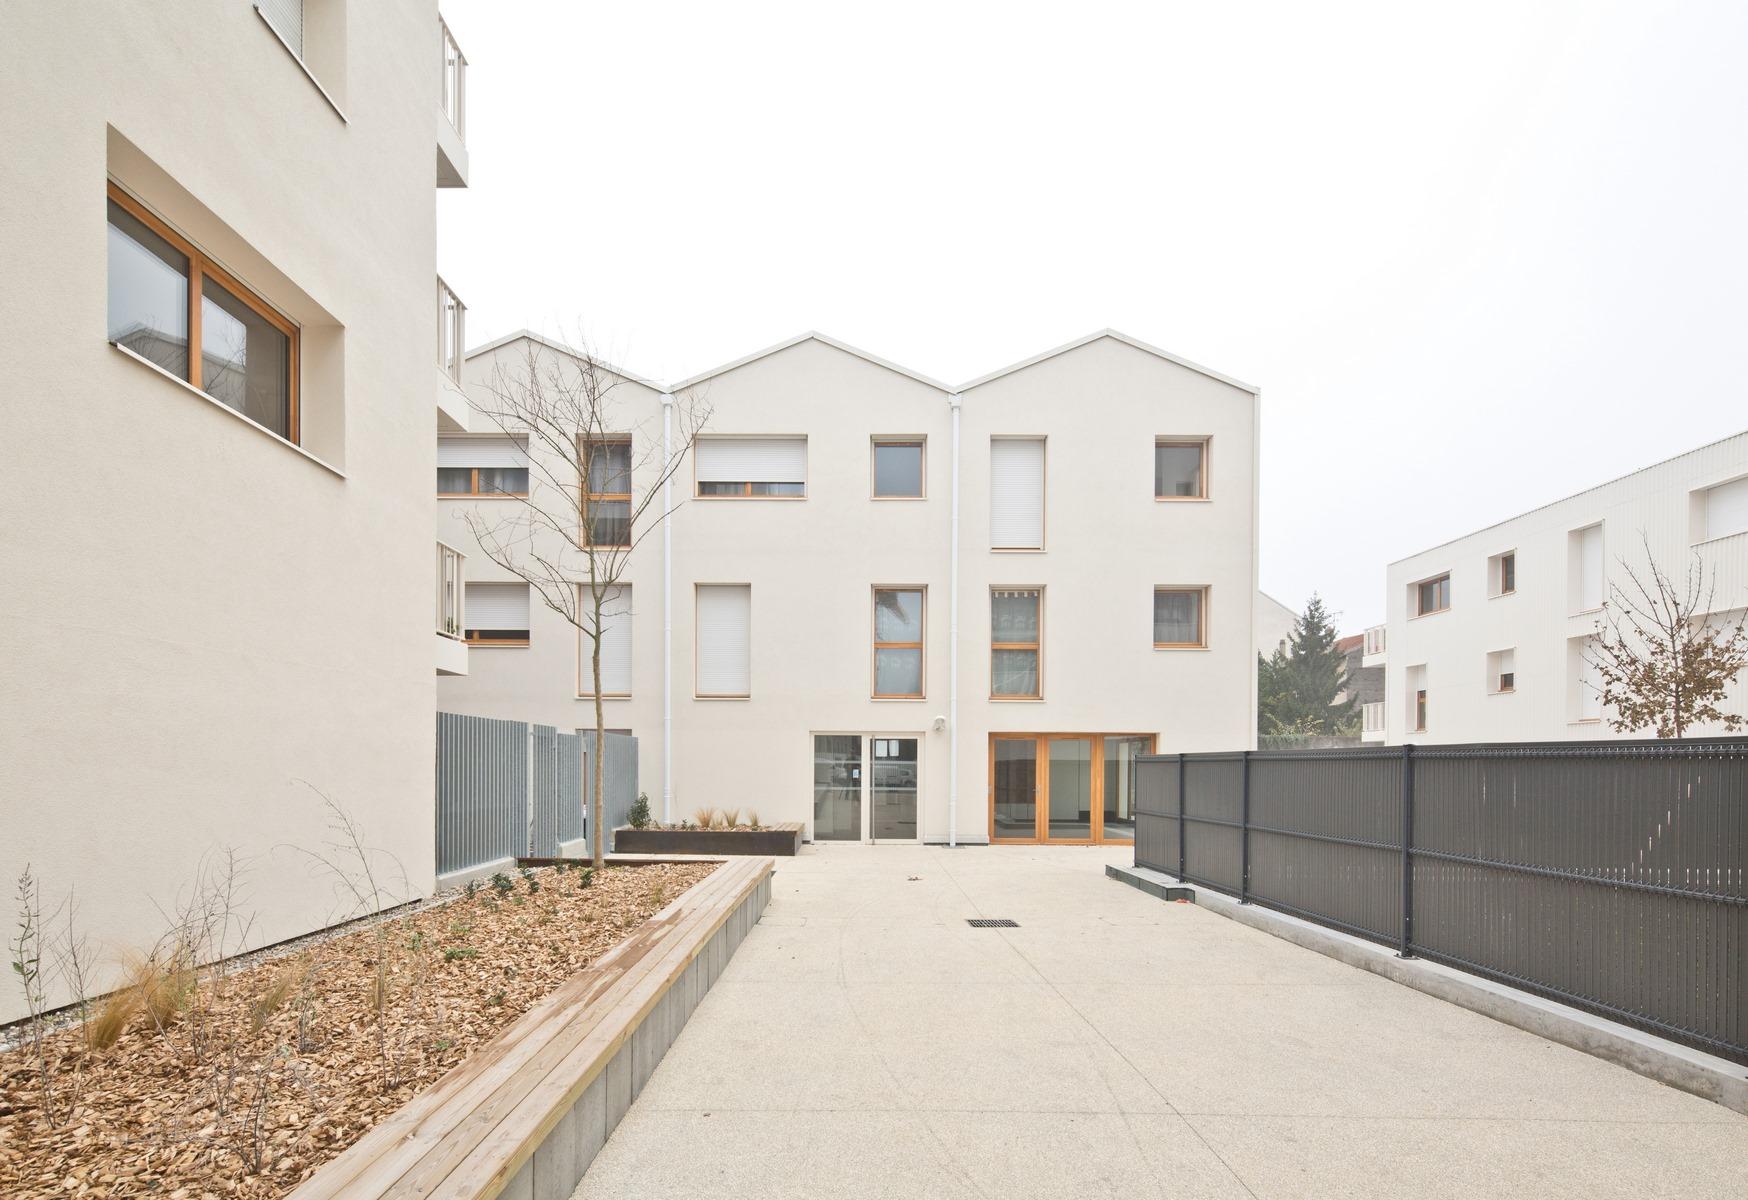 Nova Urbana : ensemble de 50 logements - Villeurbanne - Z Architecture